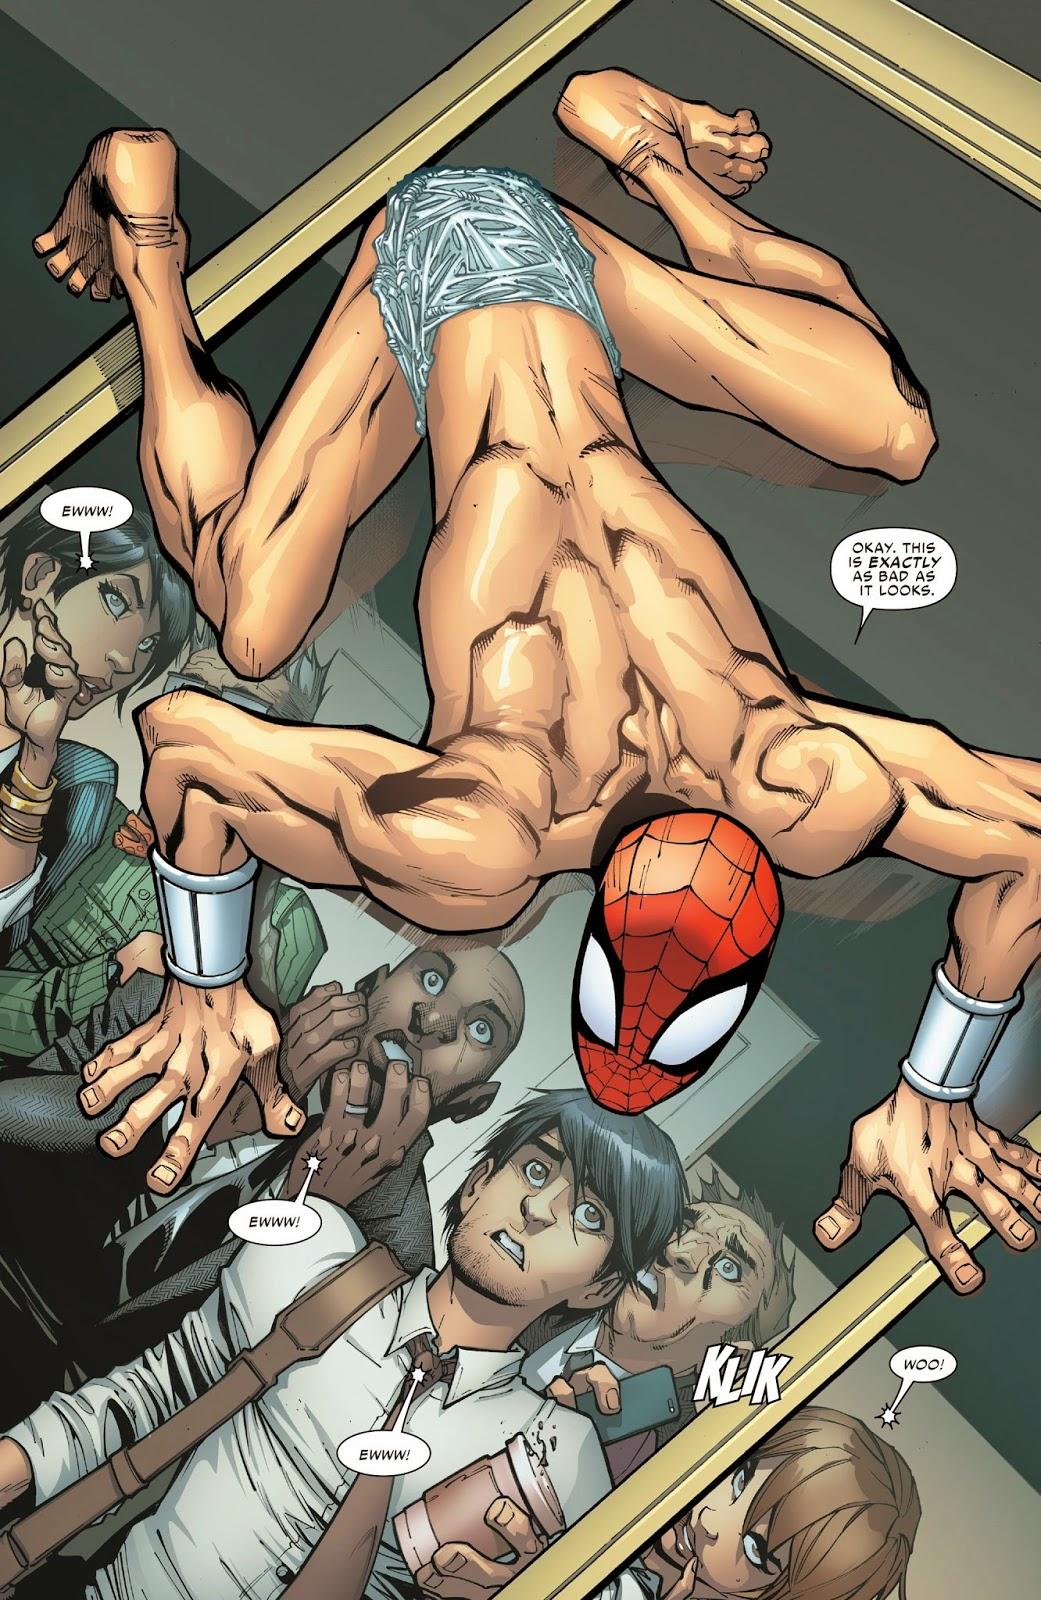 Hot gay sex shirtless men danny 2